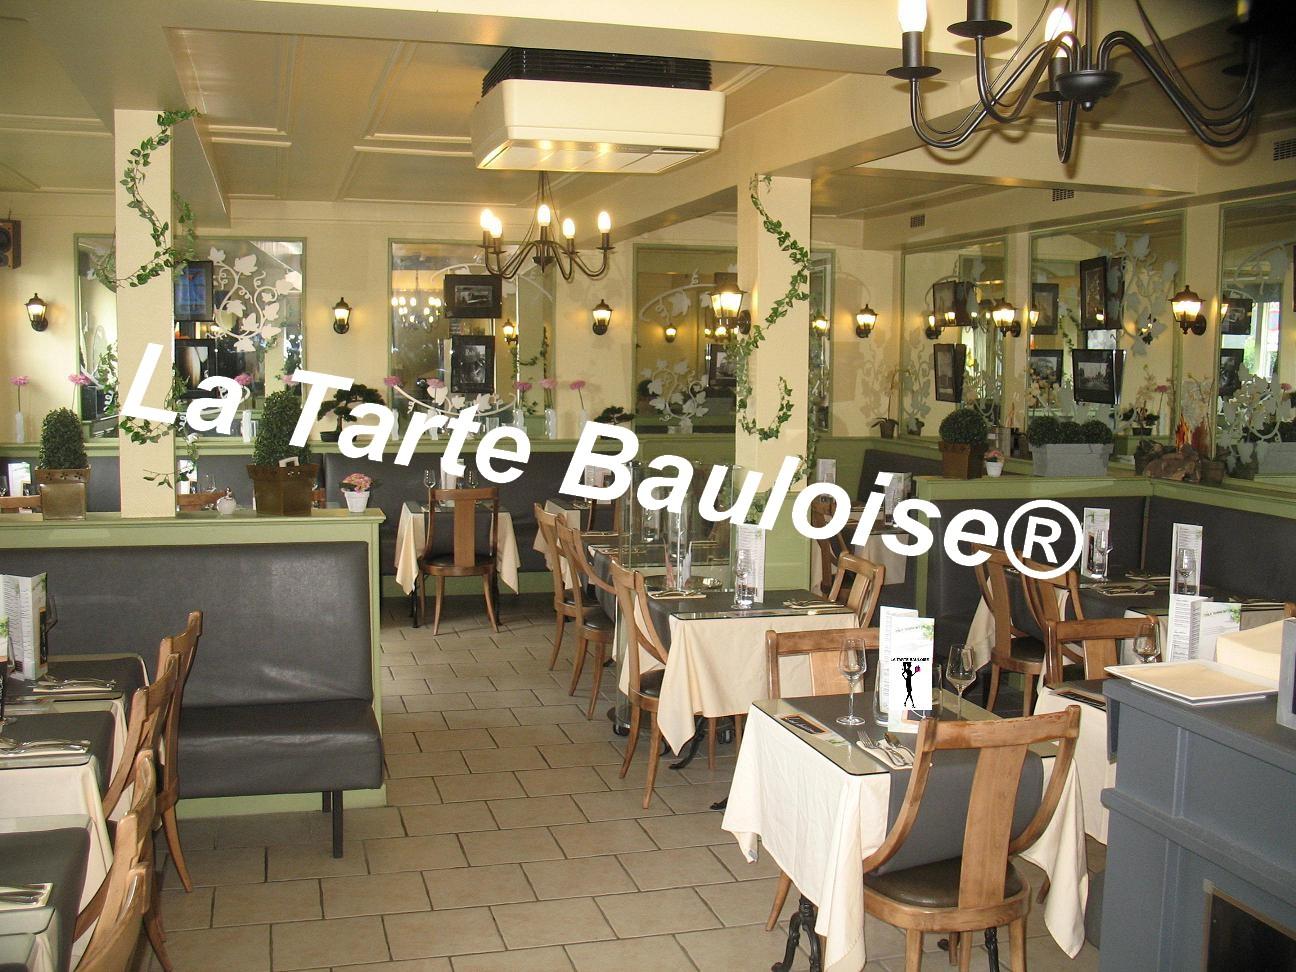 la_tarte_bauloise_kisskissbankbank_licence-1415438903.jpg